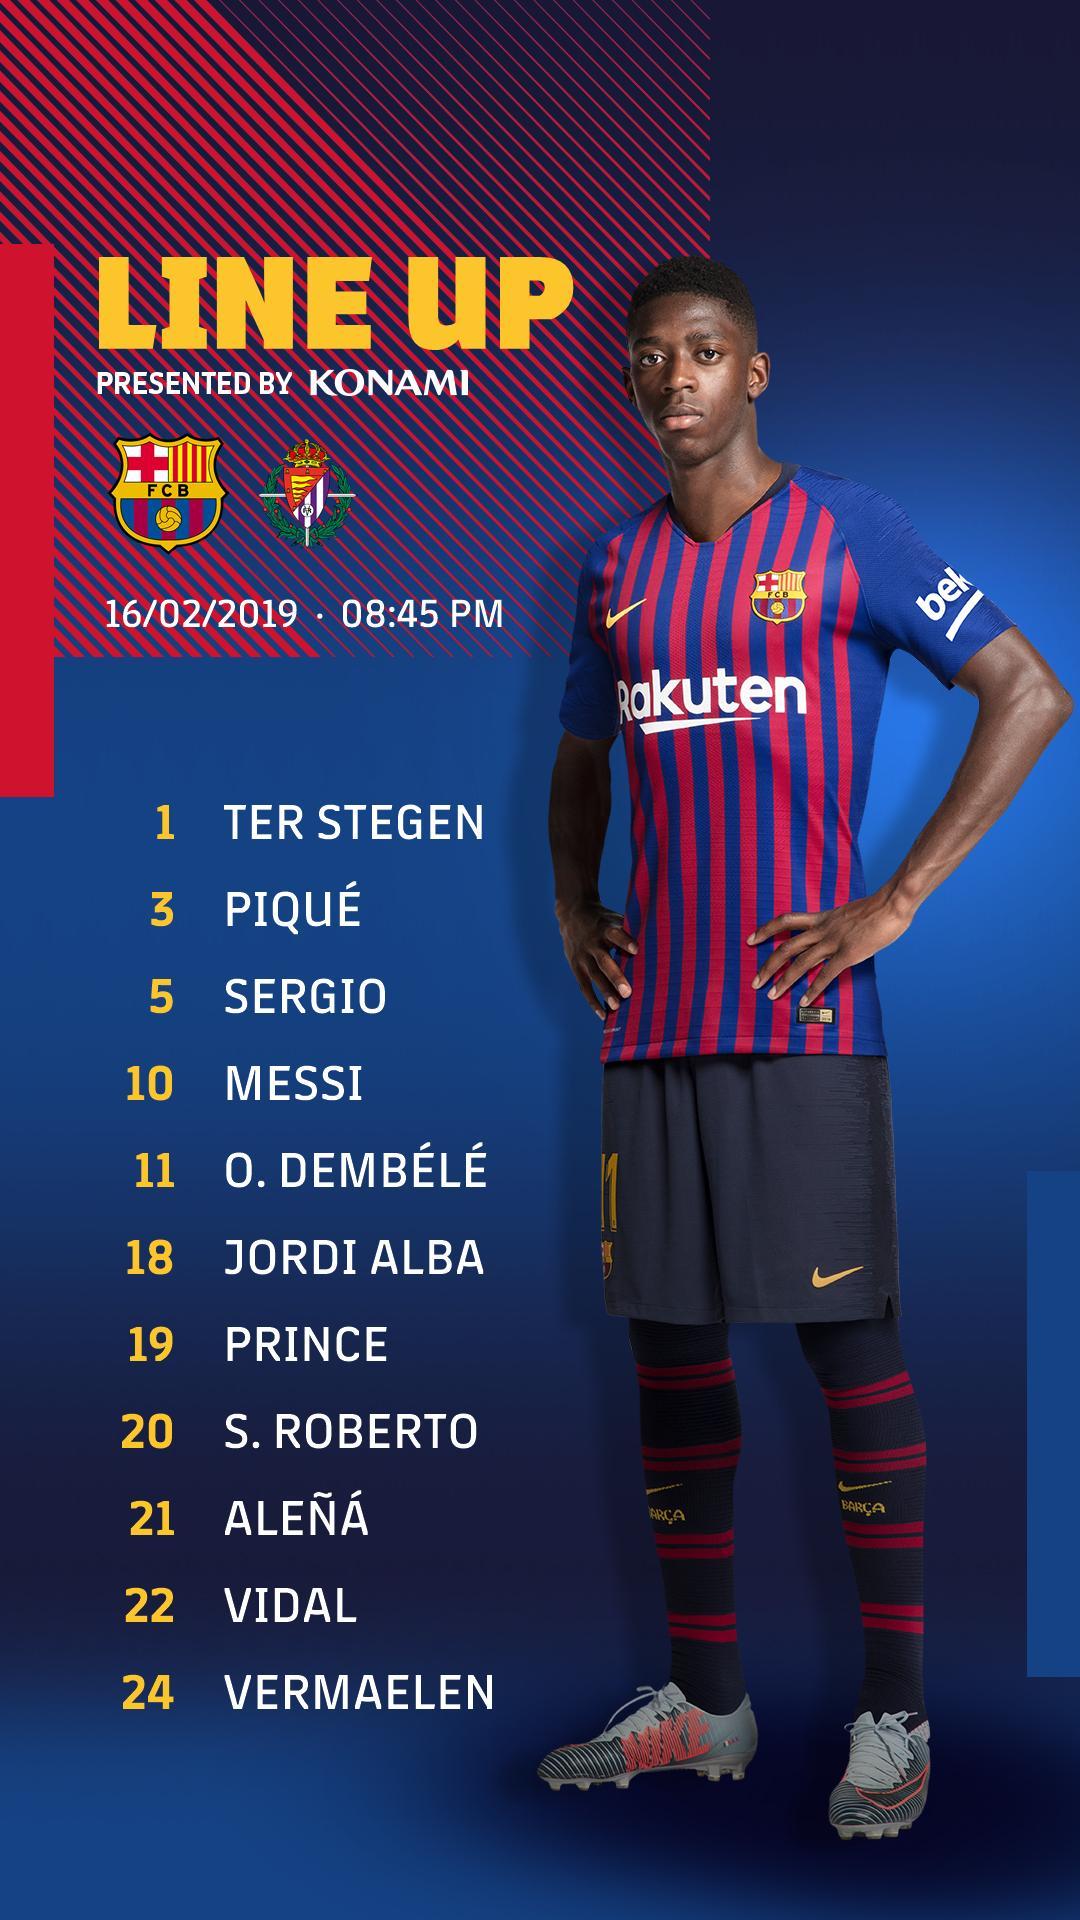 ���� Barça XI #BarçaValladolid https://t.co/zNFkkFpCqw